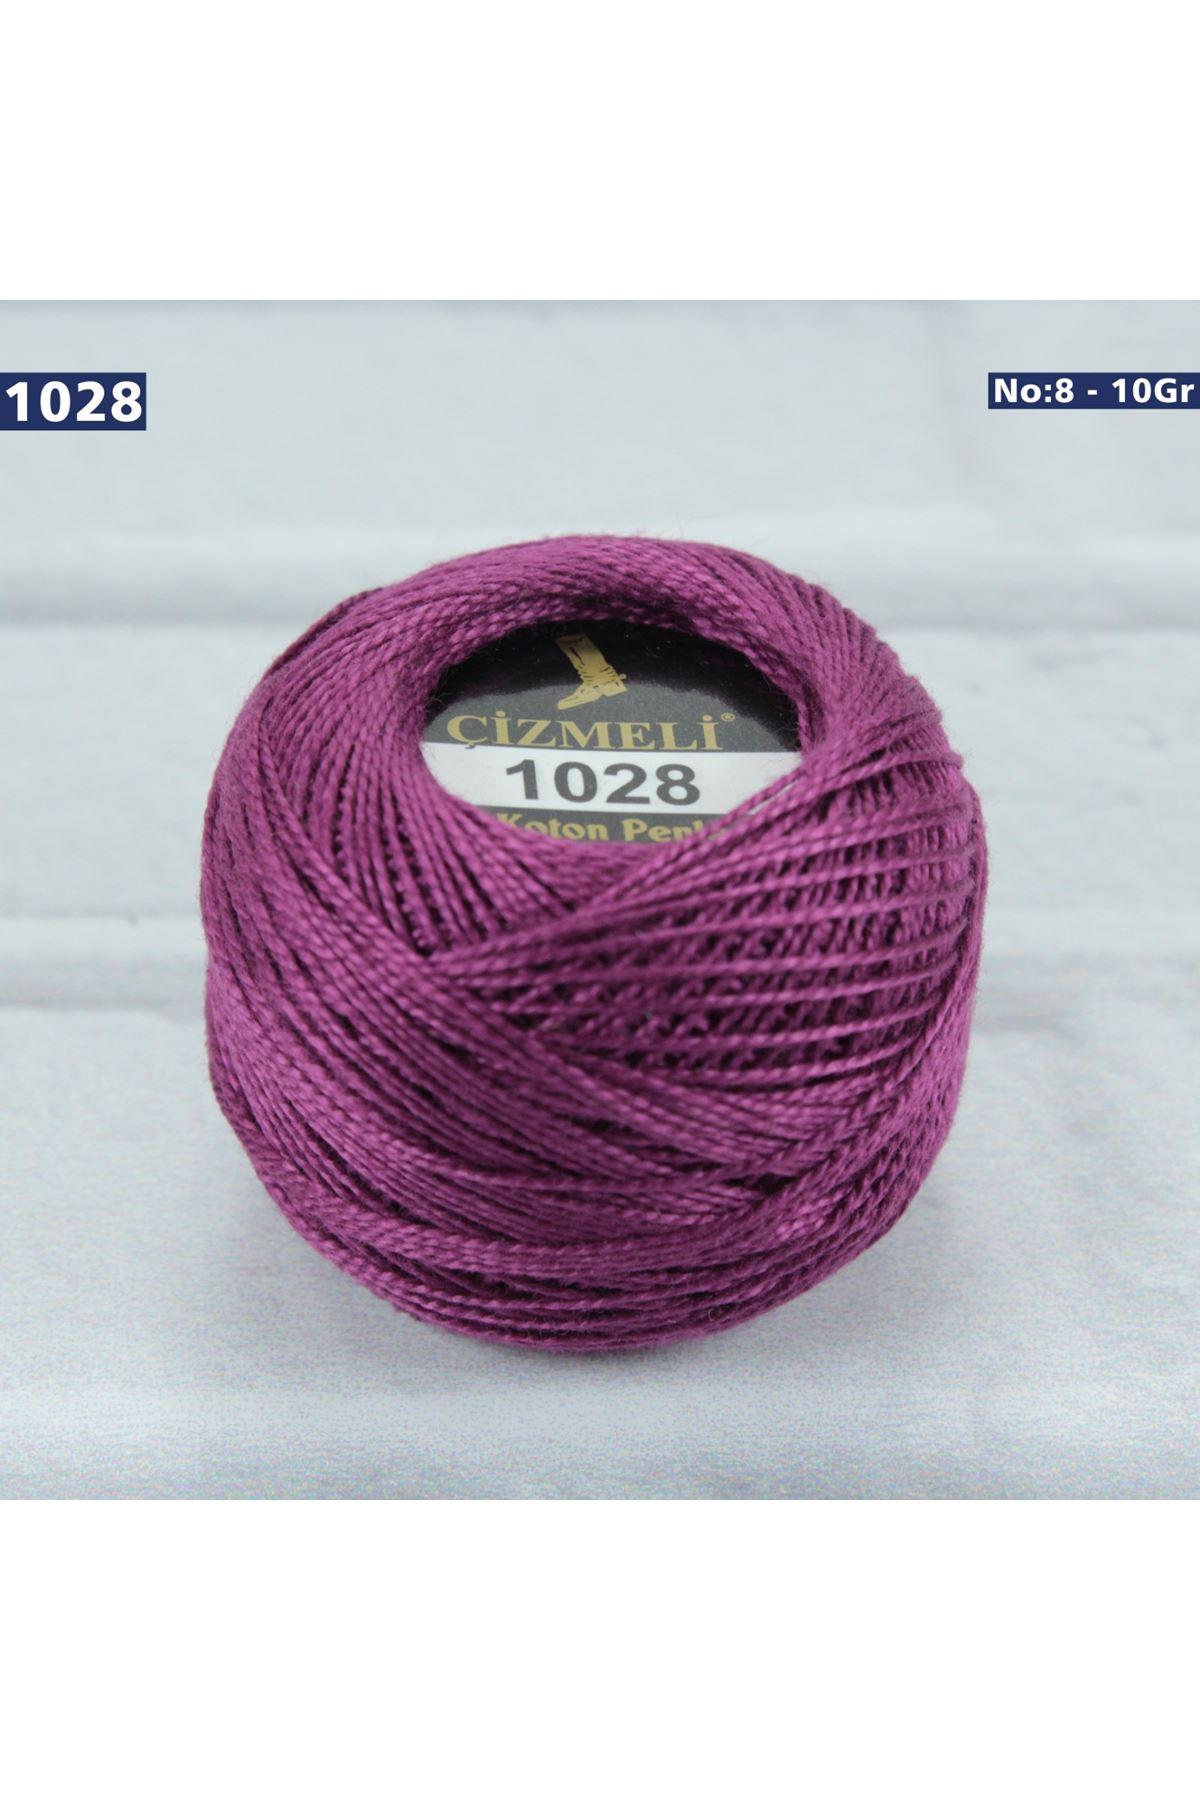 Çizmeli Cotton Perle Nakış İpliği No: 1028